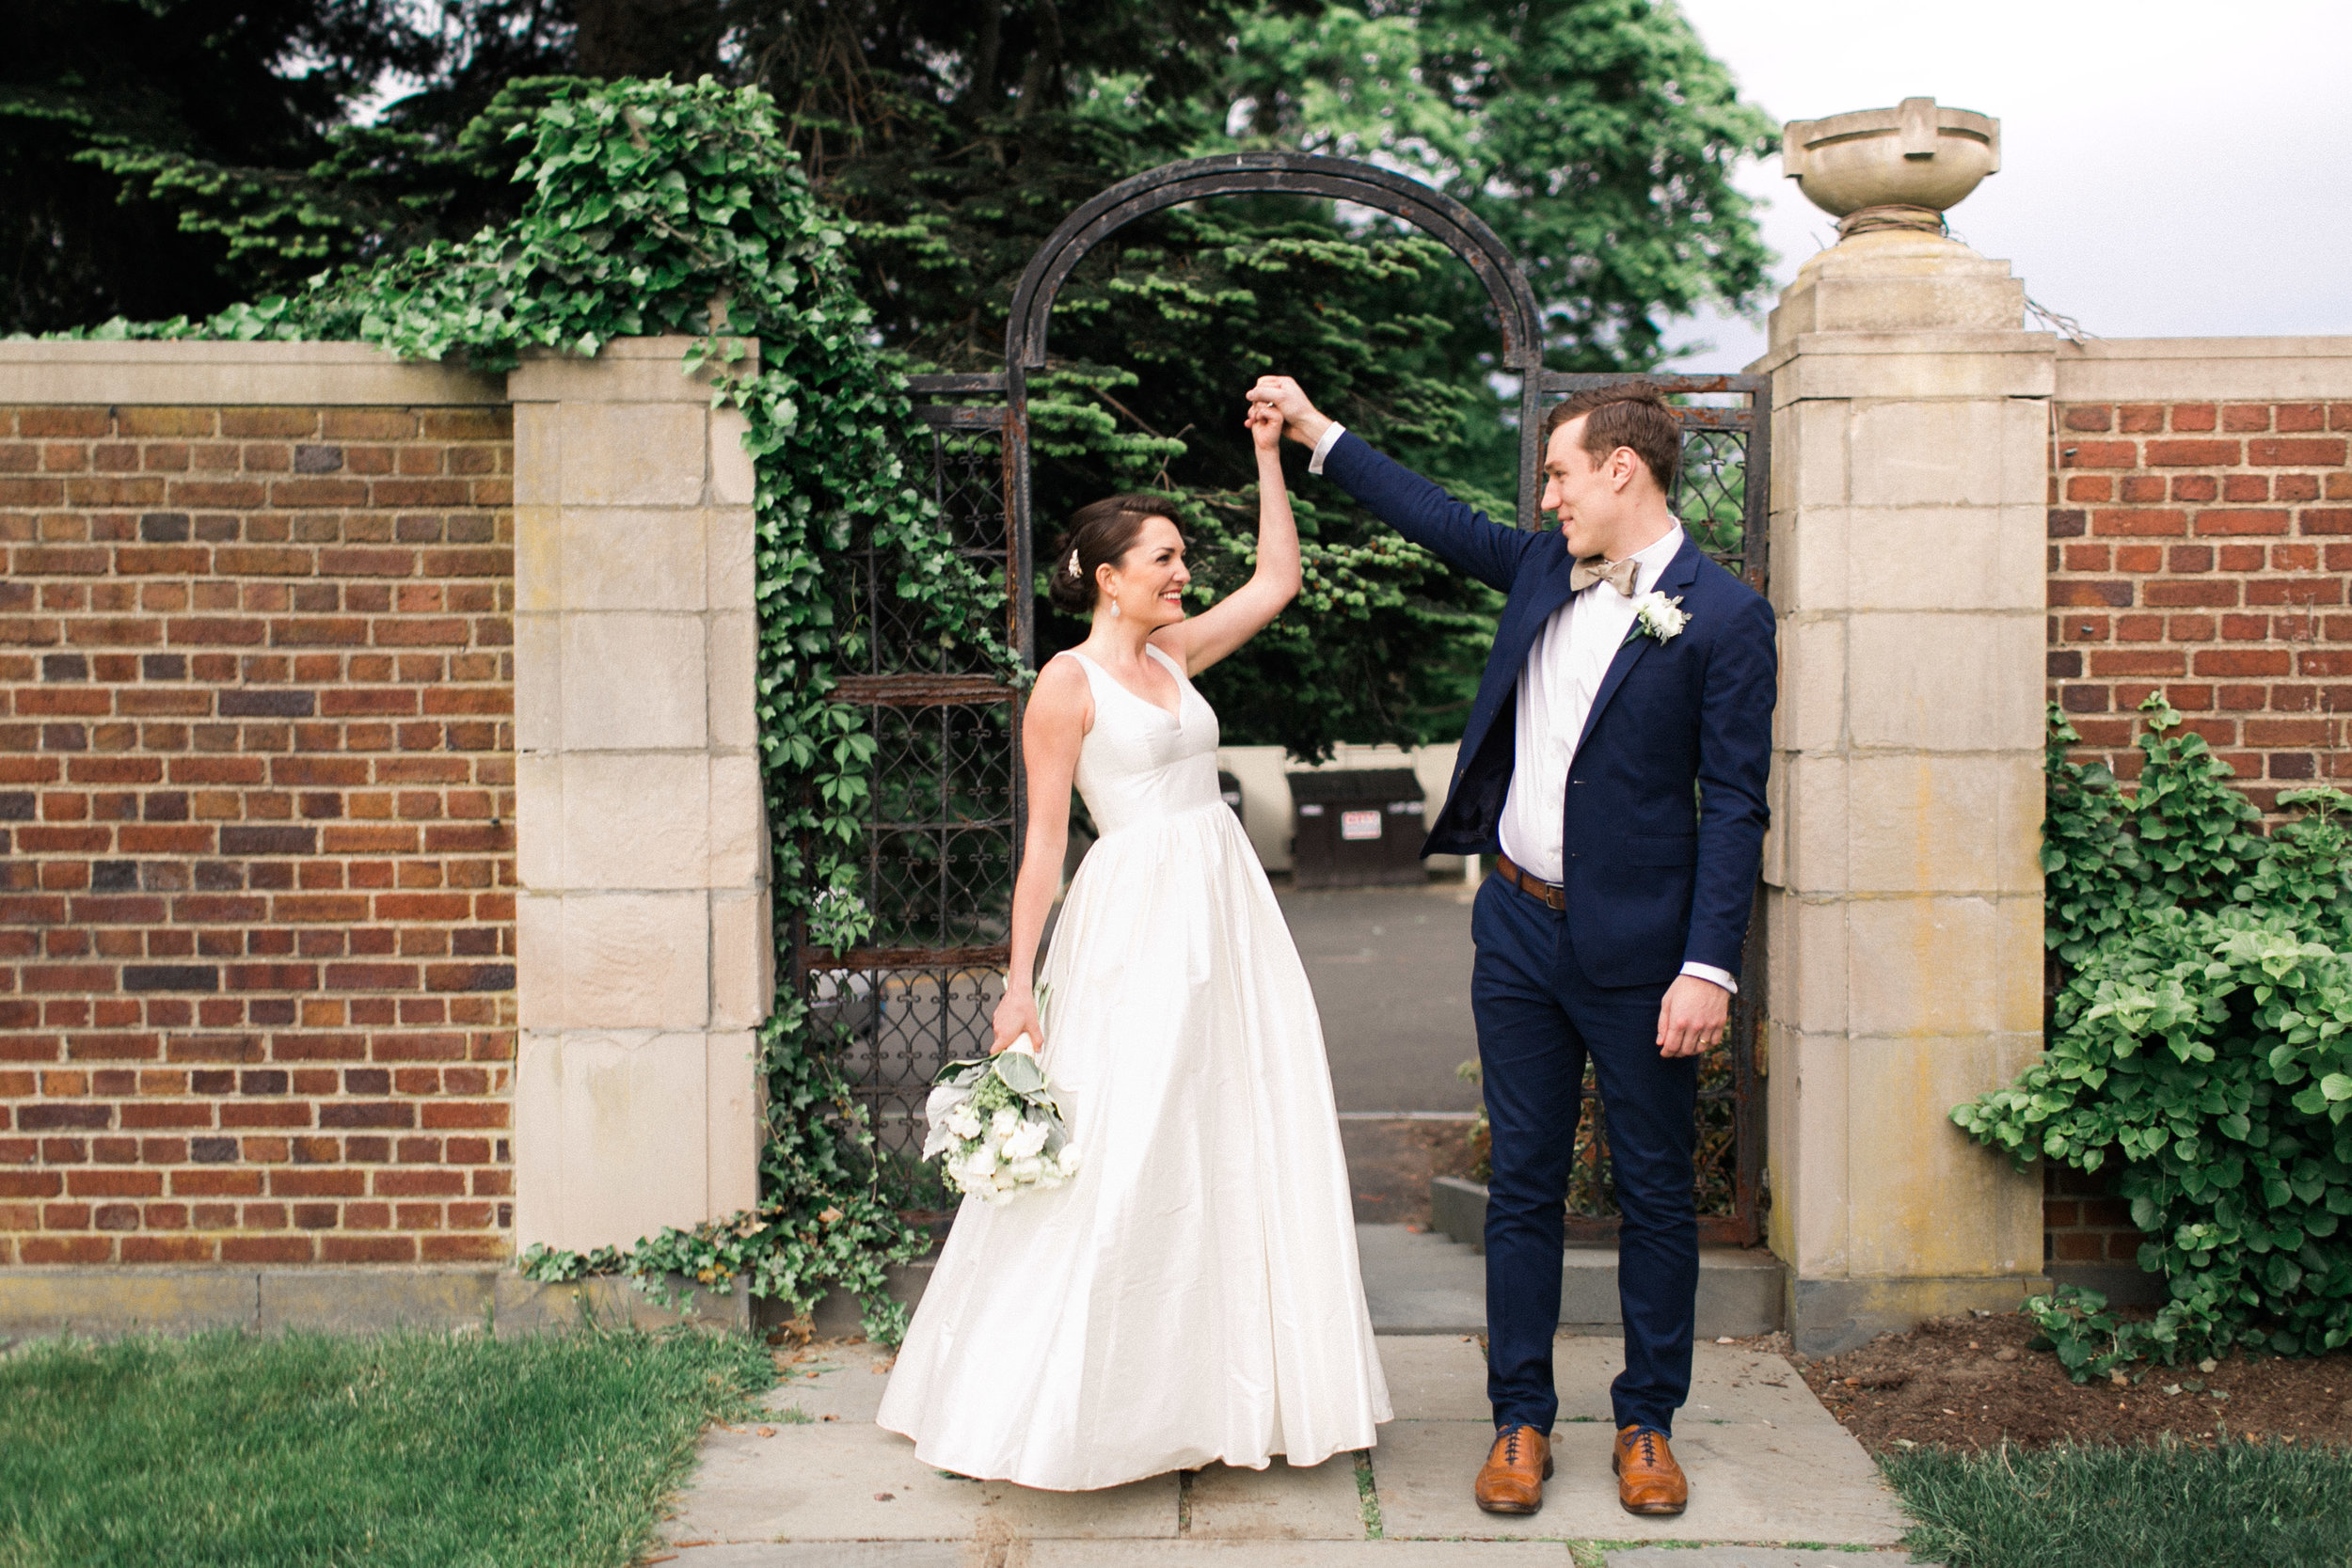 mayden photography weddings-91.jpg